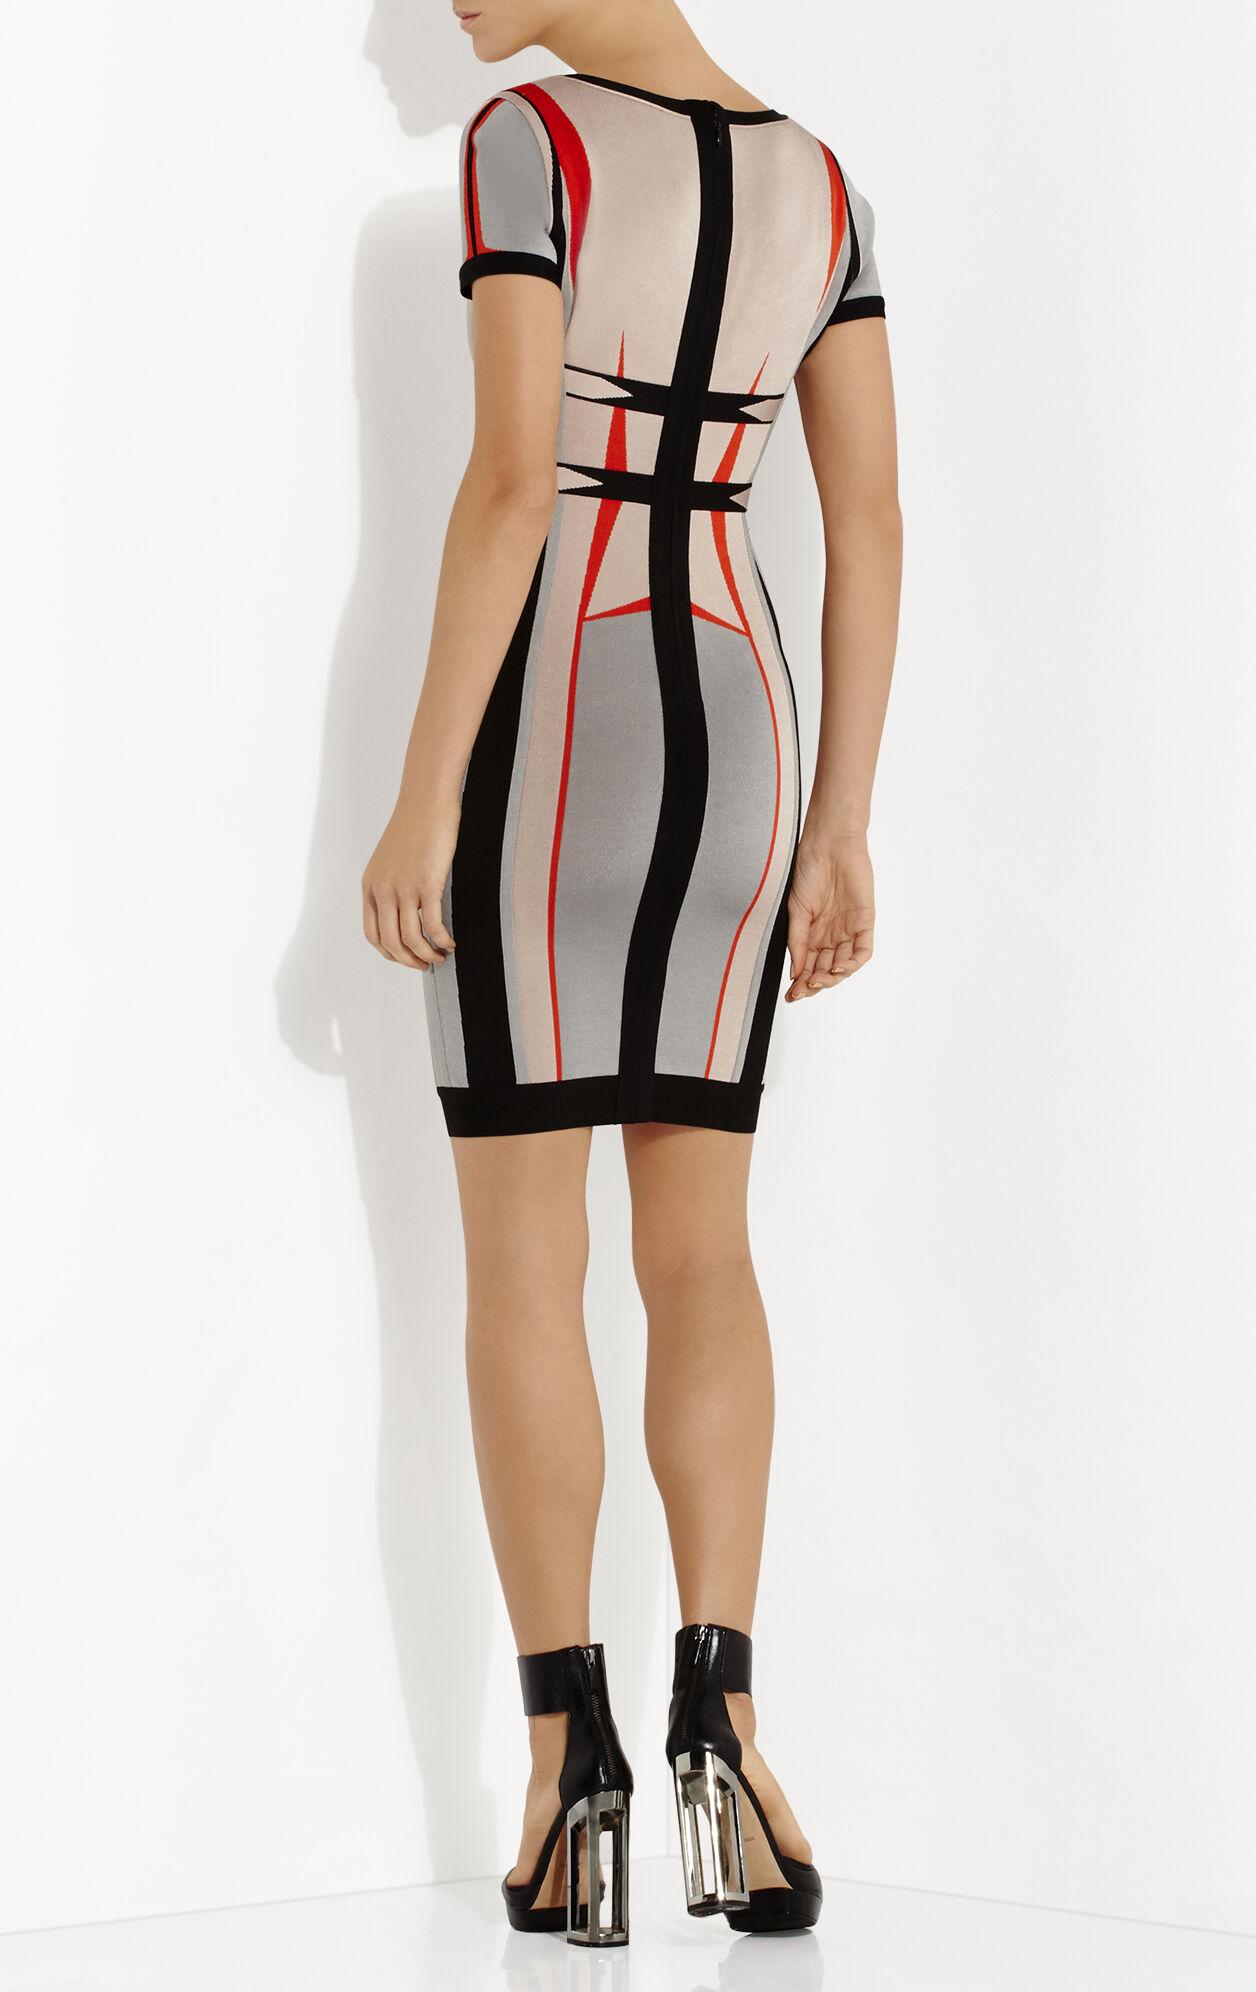 Gabi Engineered Colorblocked Jacquard Dress